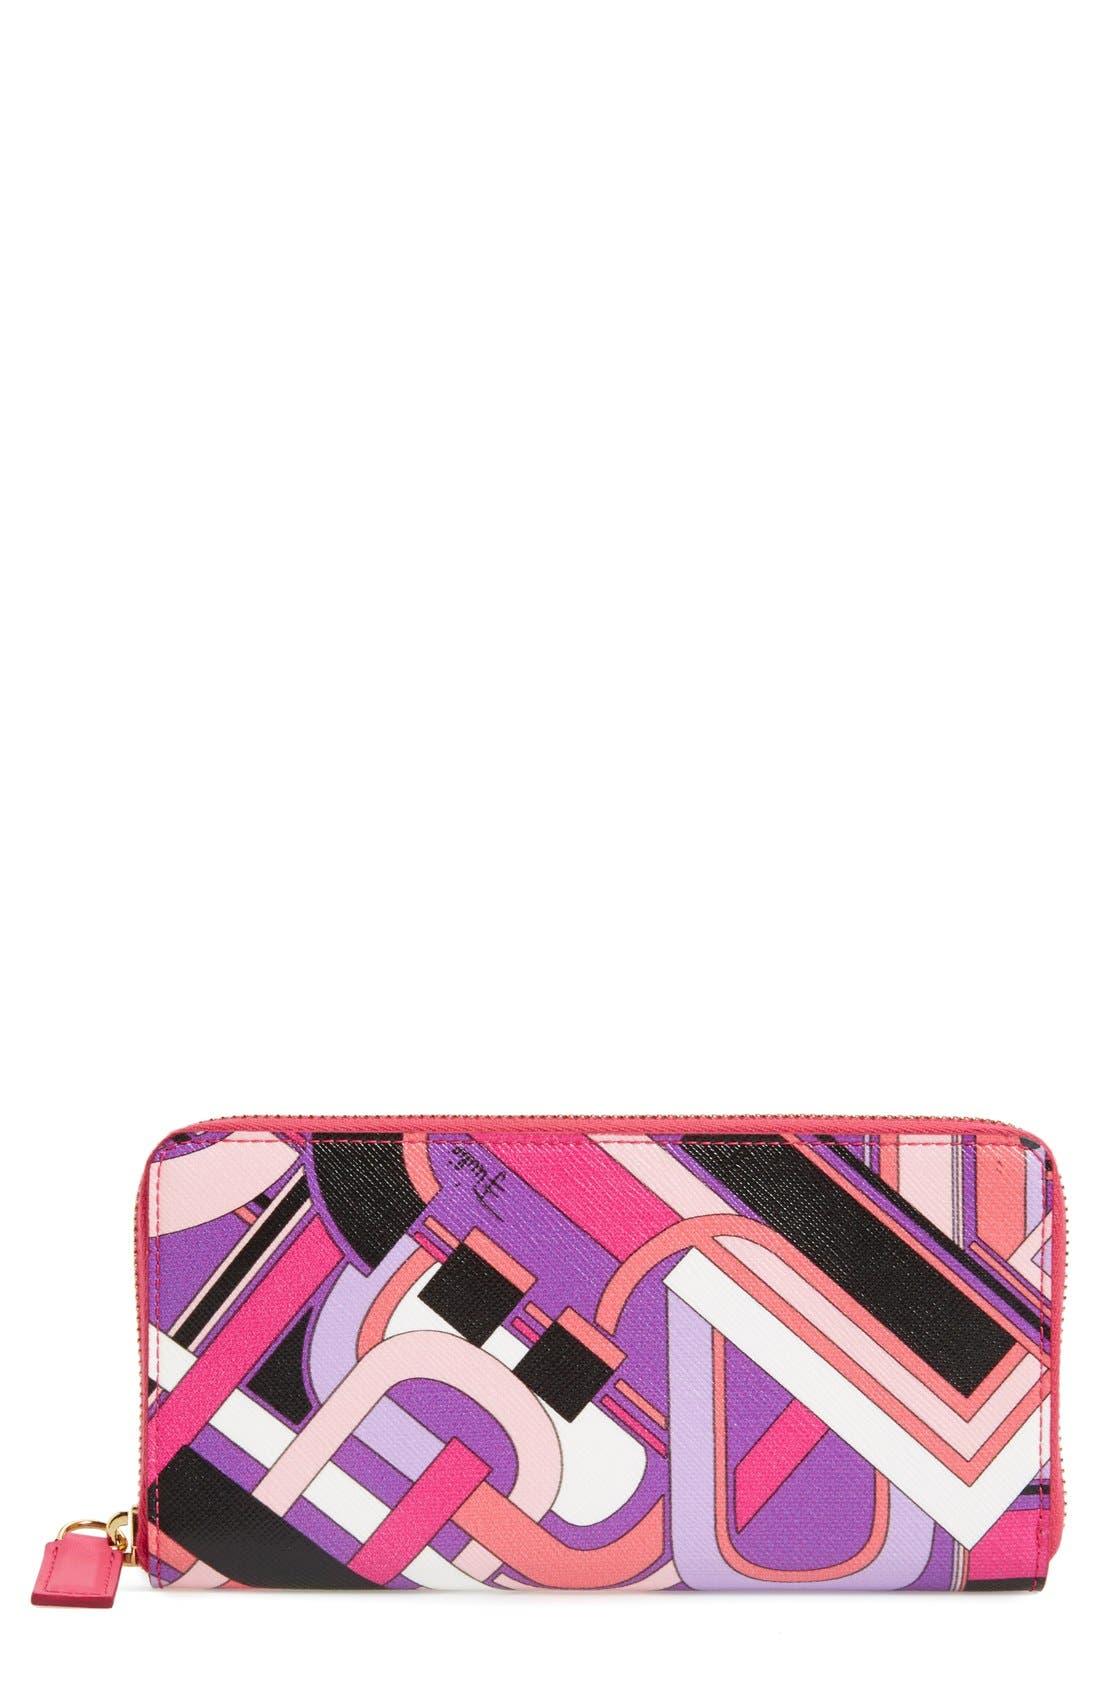 Main Image - Emilio Pucci Print Zip Around Wallet